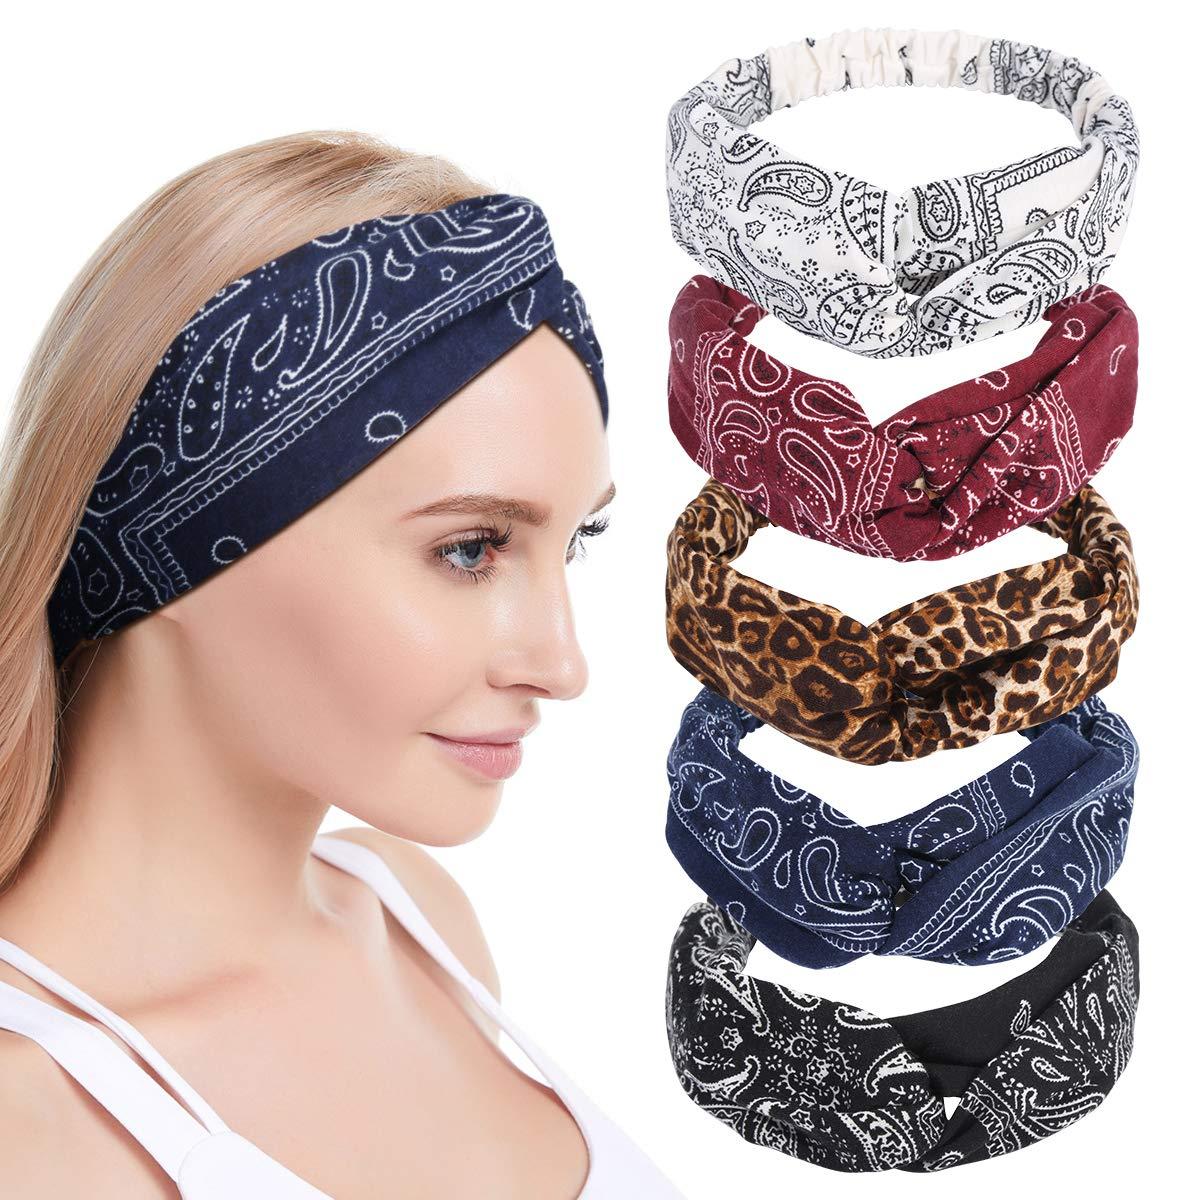 Amazon.com : Makone Headband Bandana for Women, 5pcs Women's Headbands,  Printed Headband Soft, Boho Knot Headbands, Vintage Flower Hair Band, Yoga  Running Turban Hair Accessories : Beauty